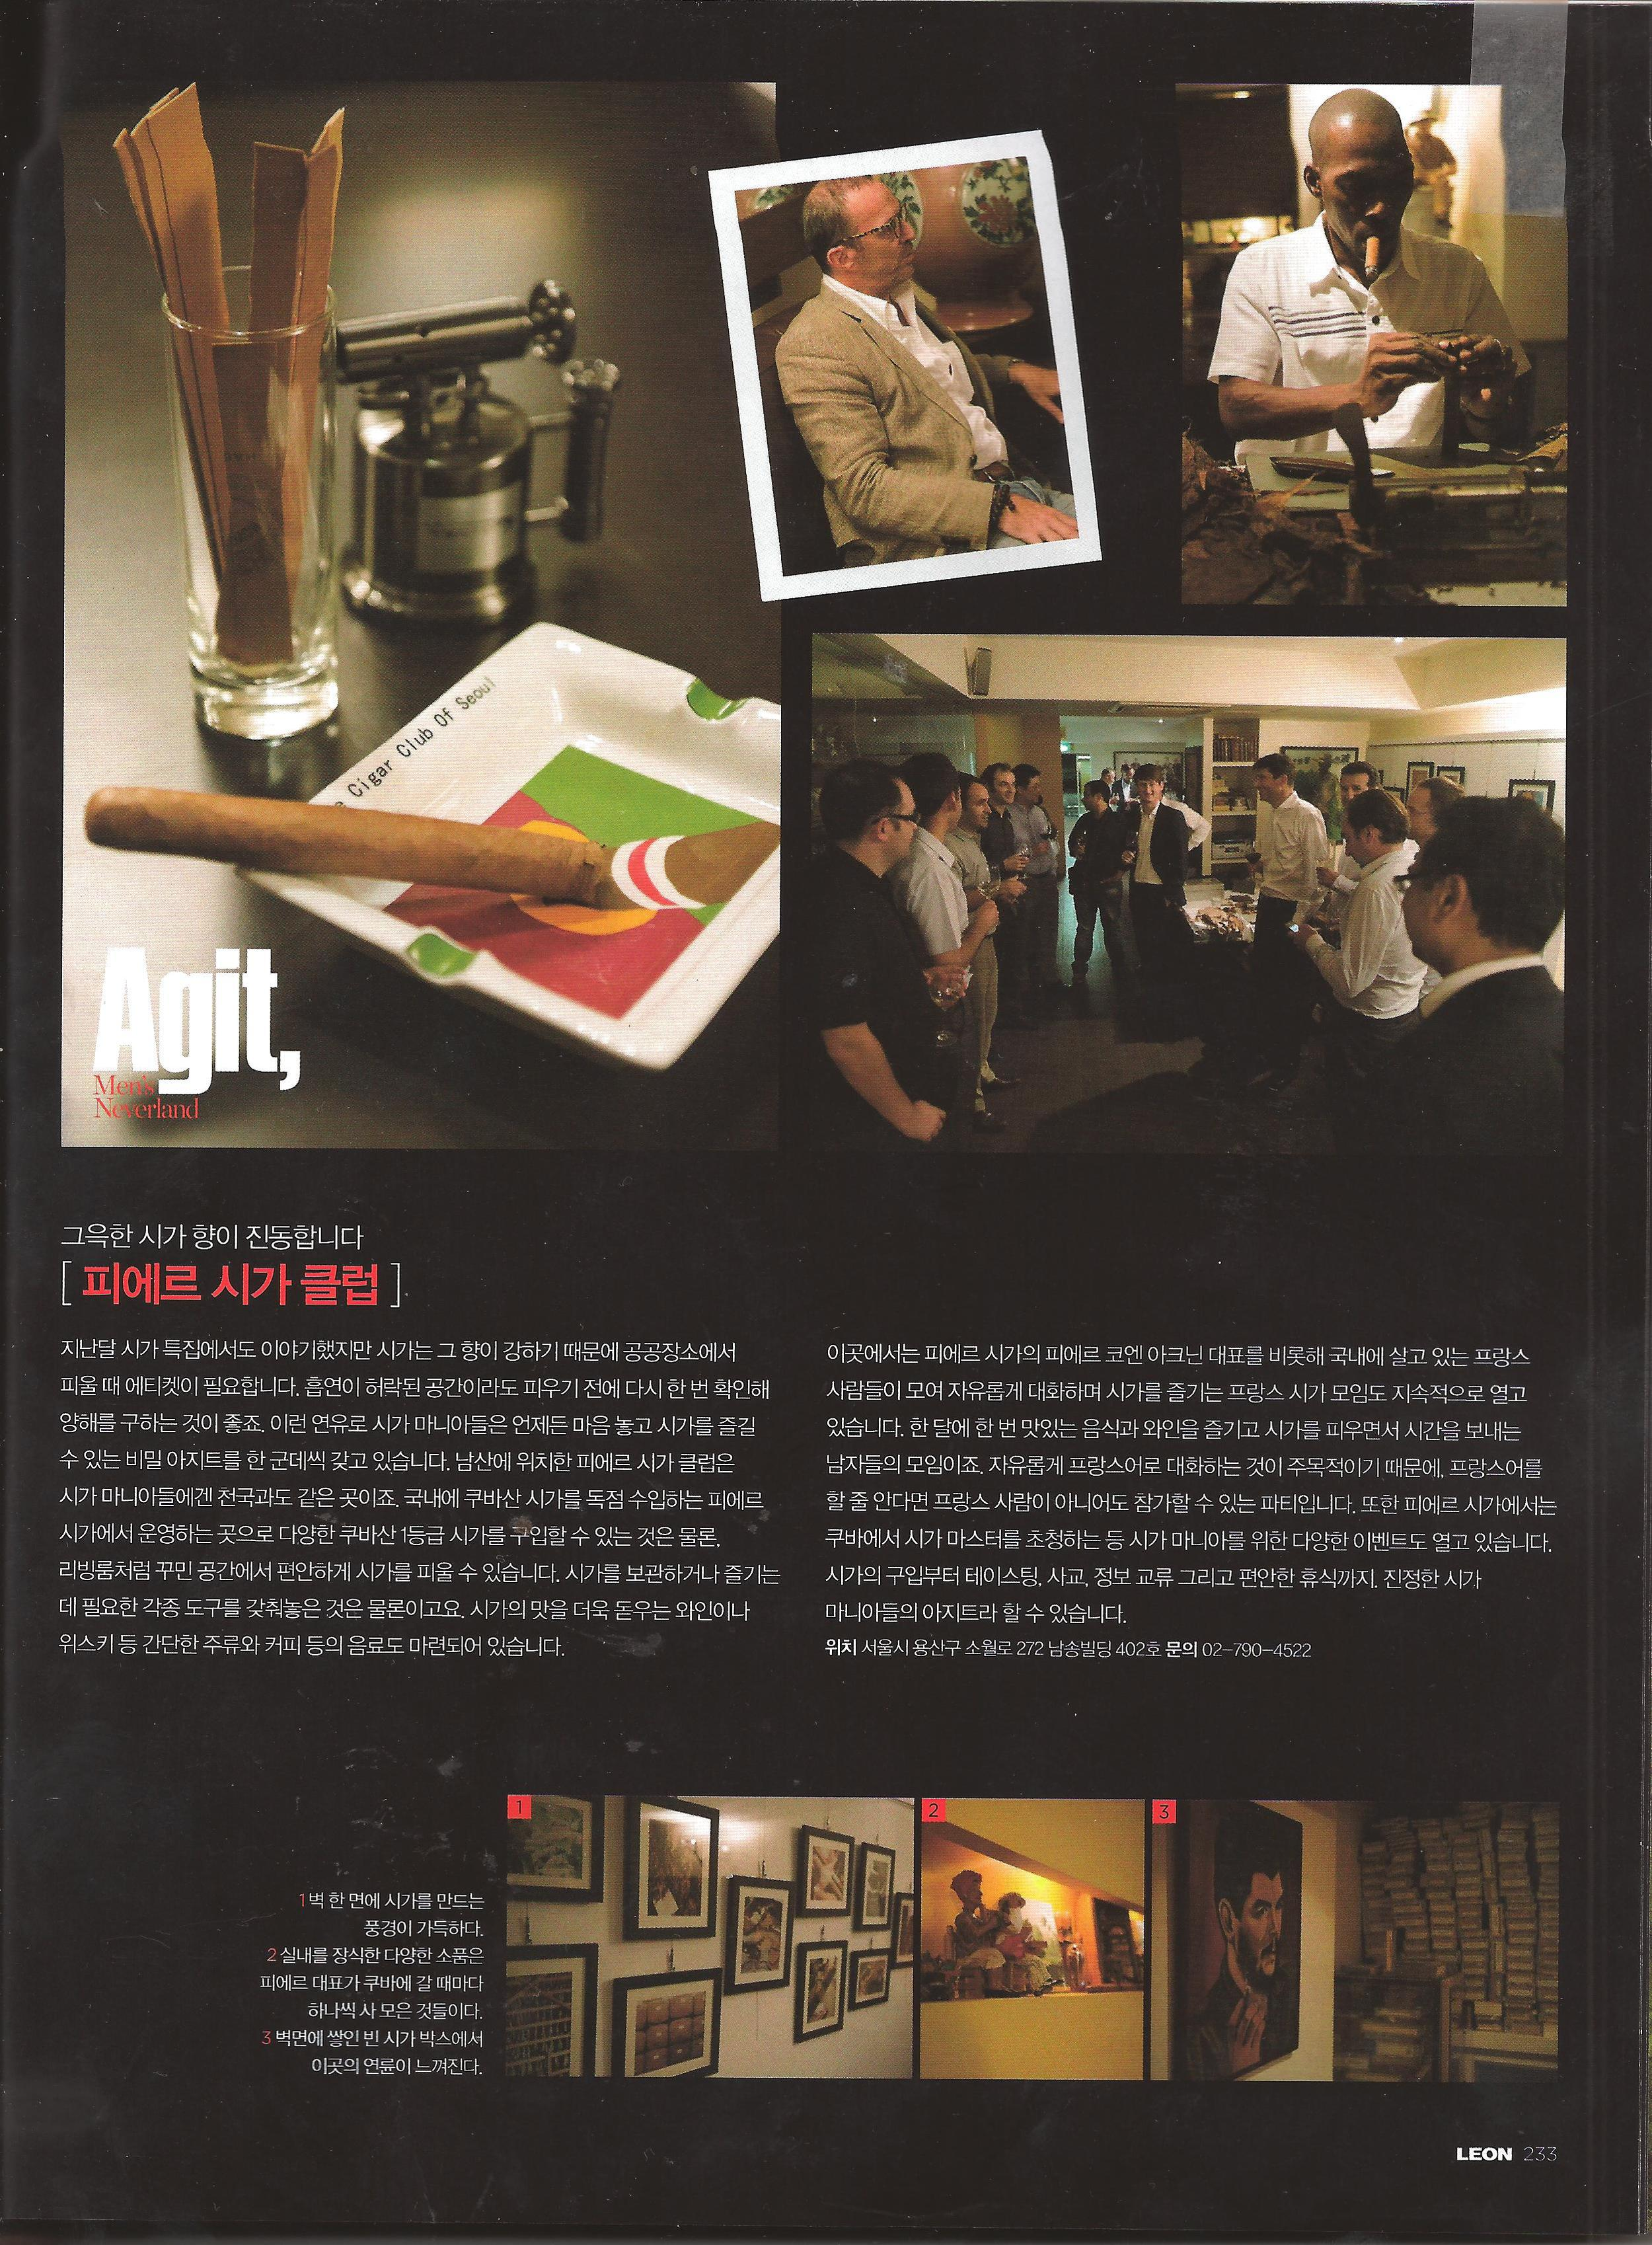 2013-10 Leon article 1.jpg